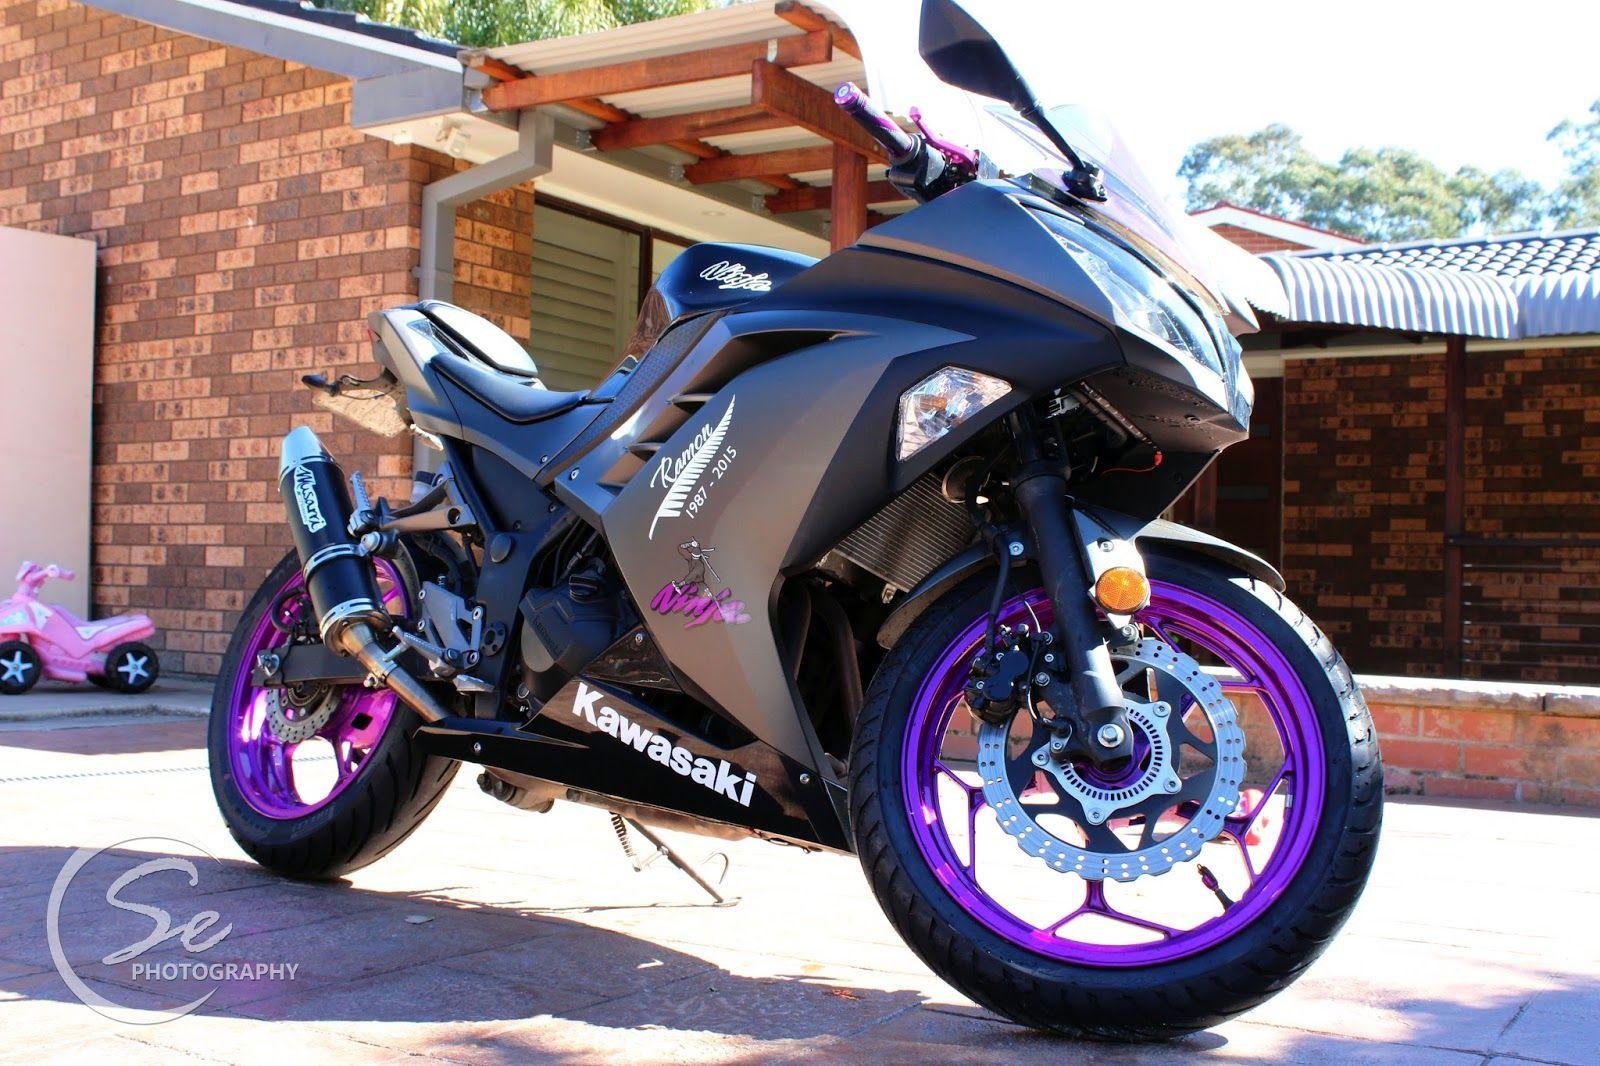 kawasaki ninja 300 custom bike in black amp purple